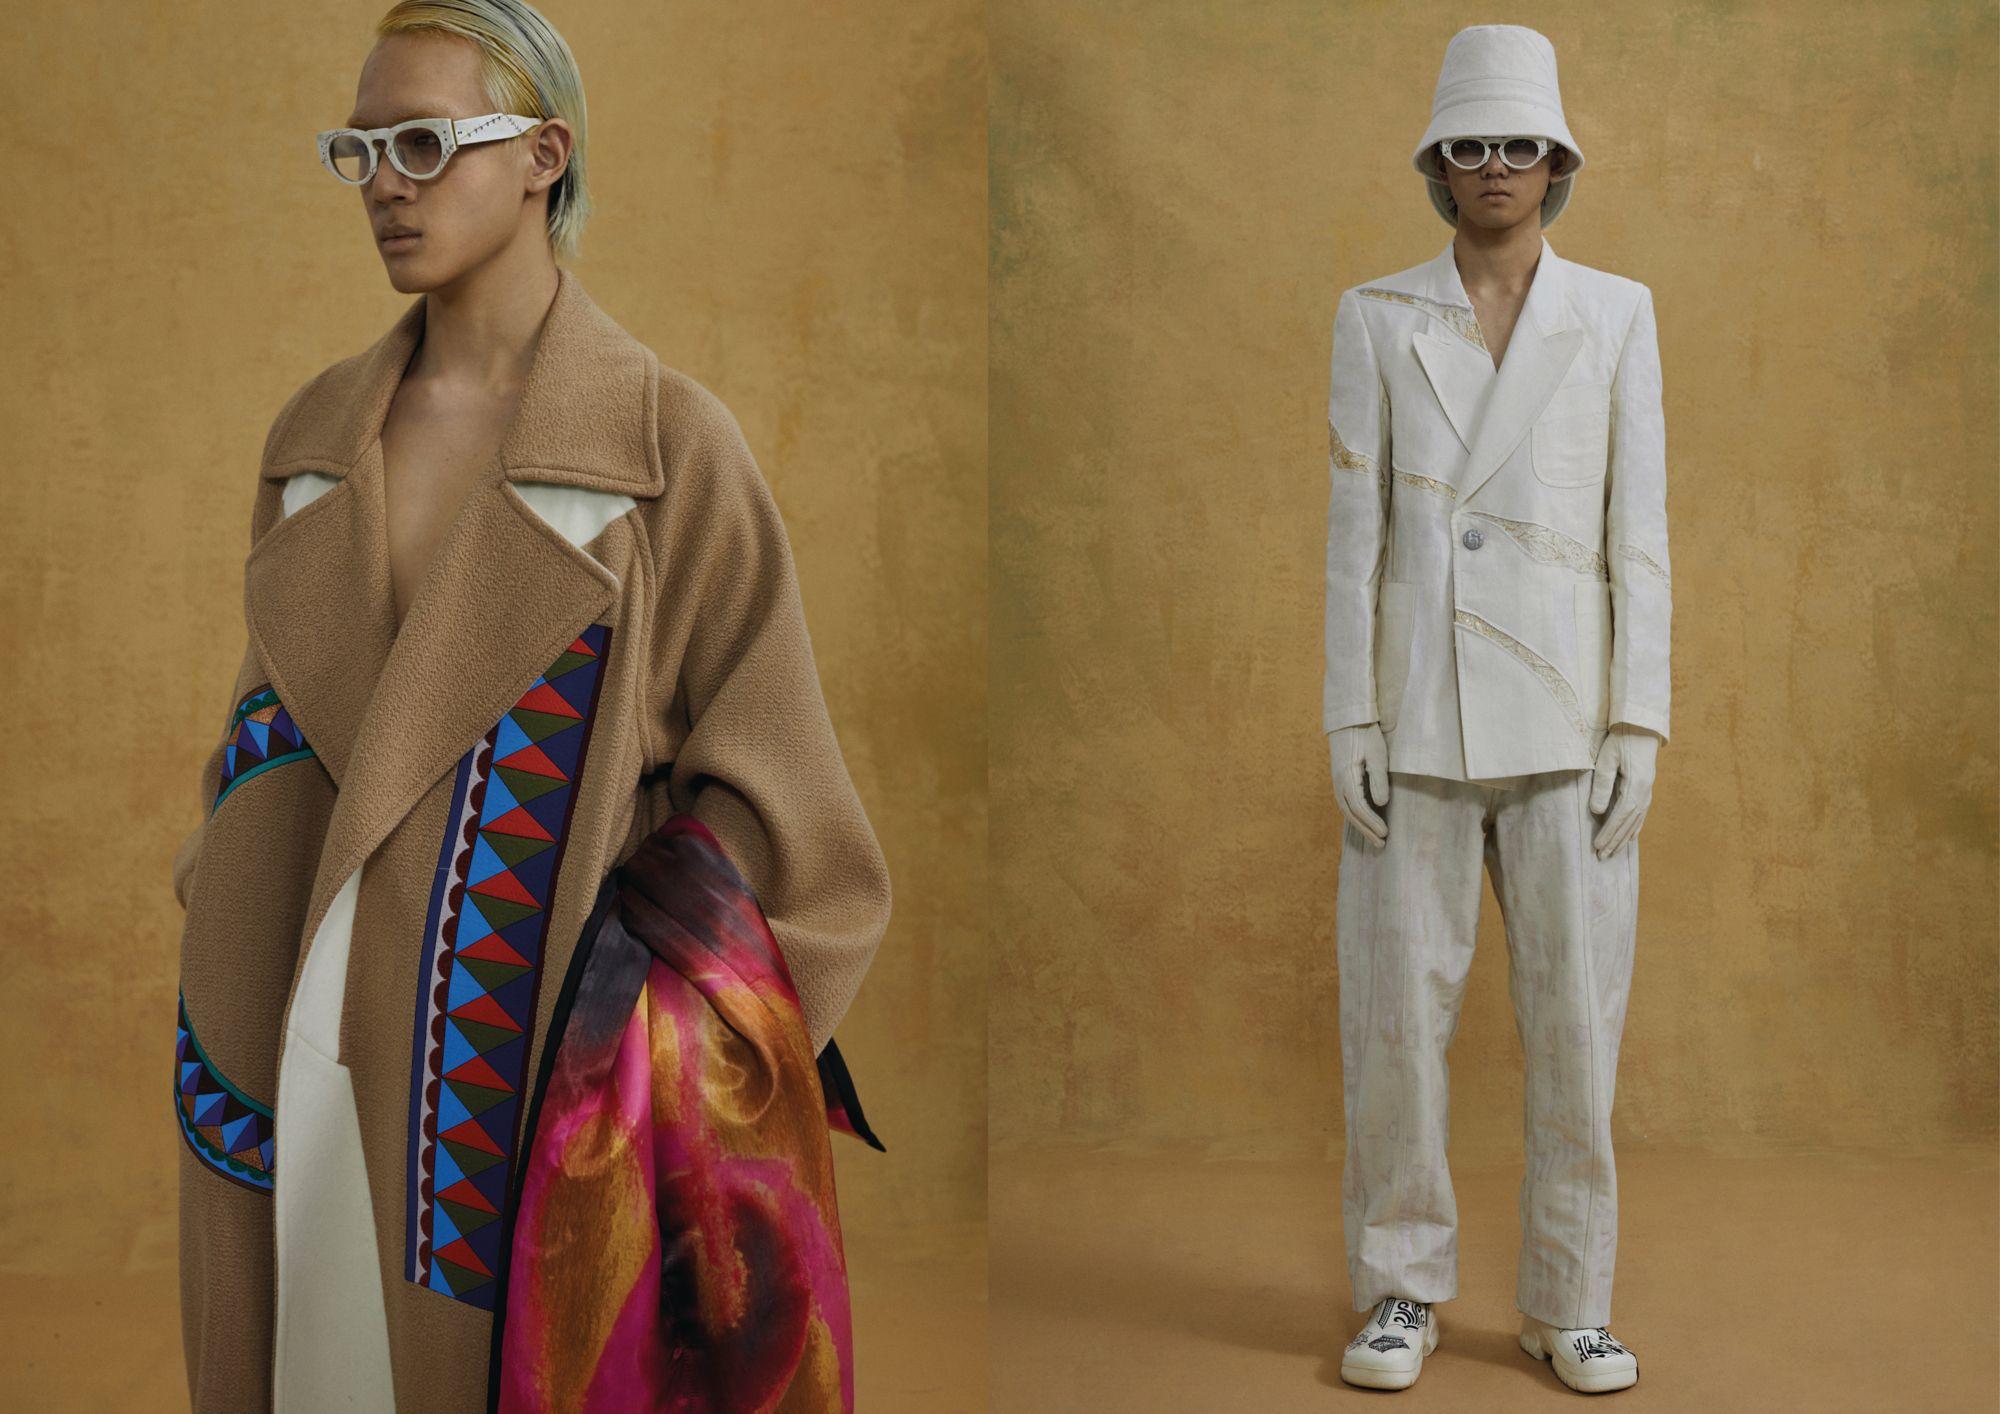 Chinese Designers Yushan Li and Jun Zhou On Their Menswear Label, Pronounce